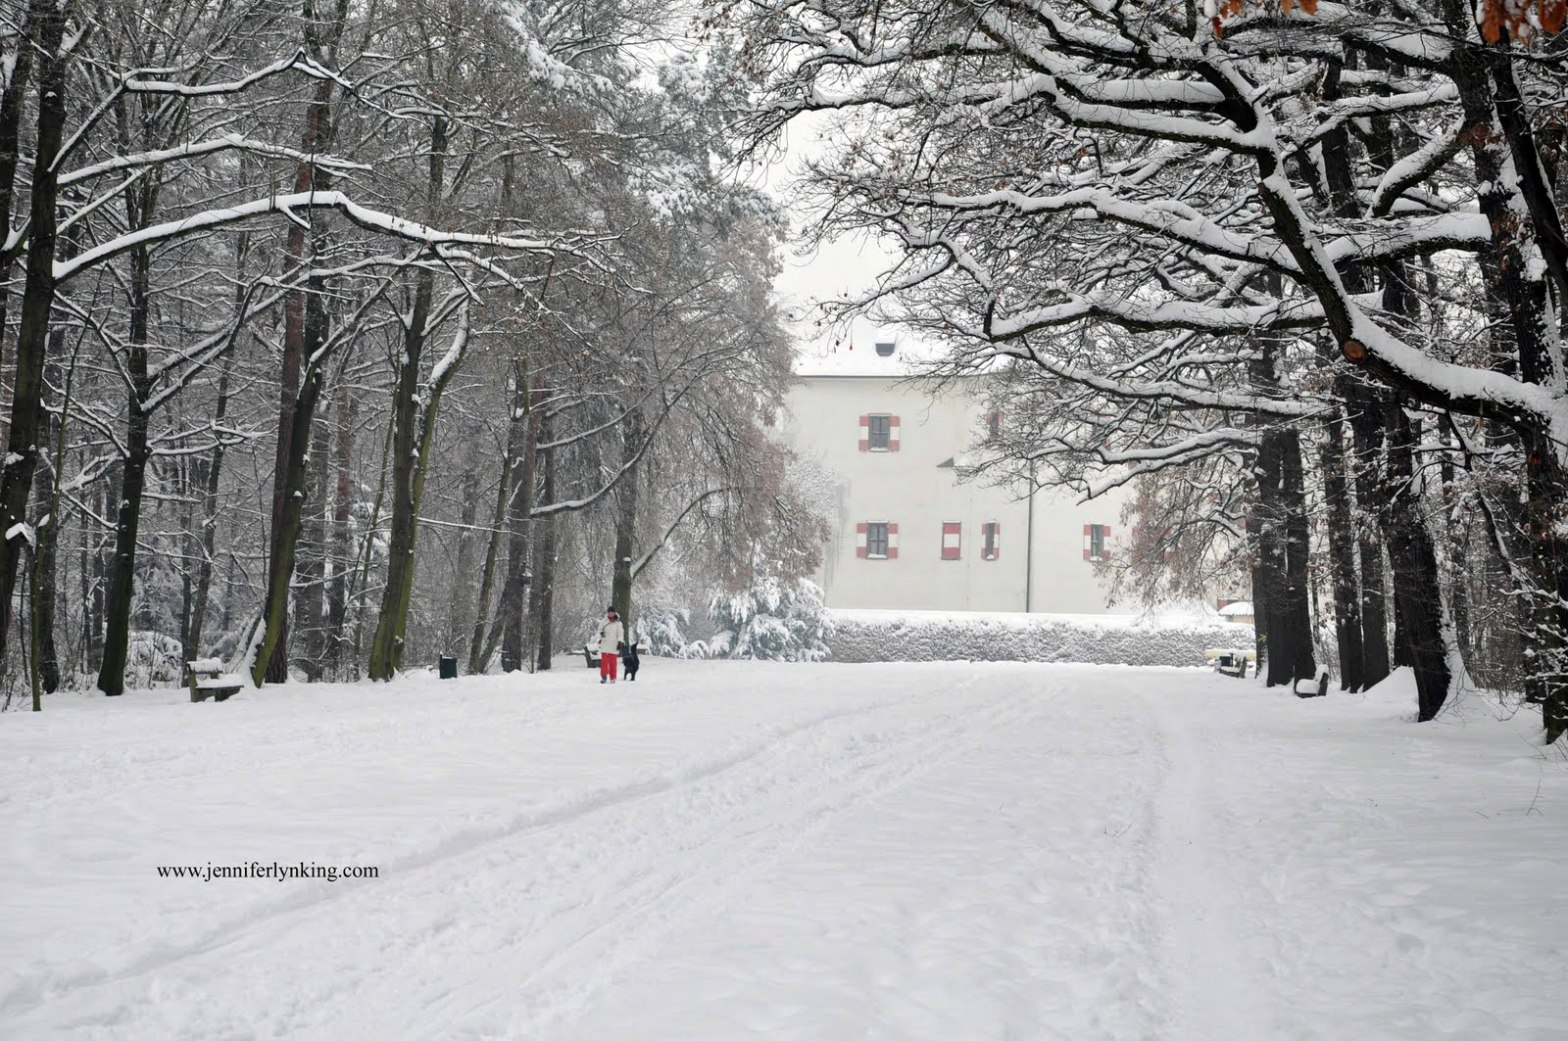 Prague's Star Summer Palace in Winter